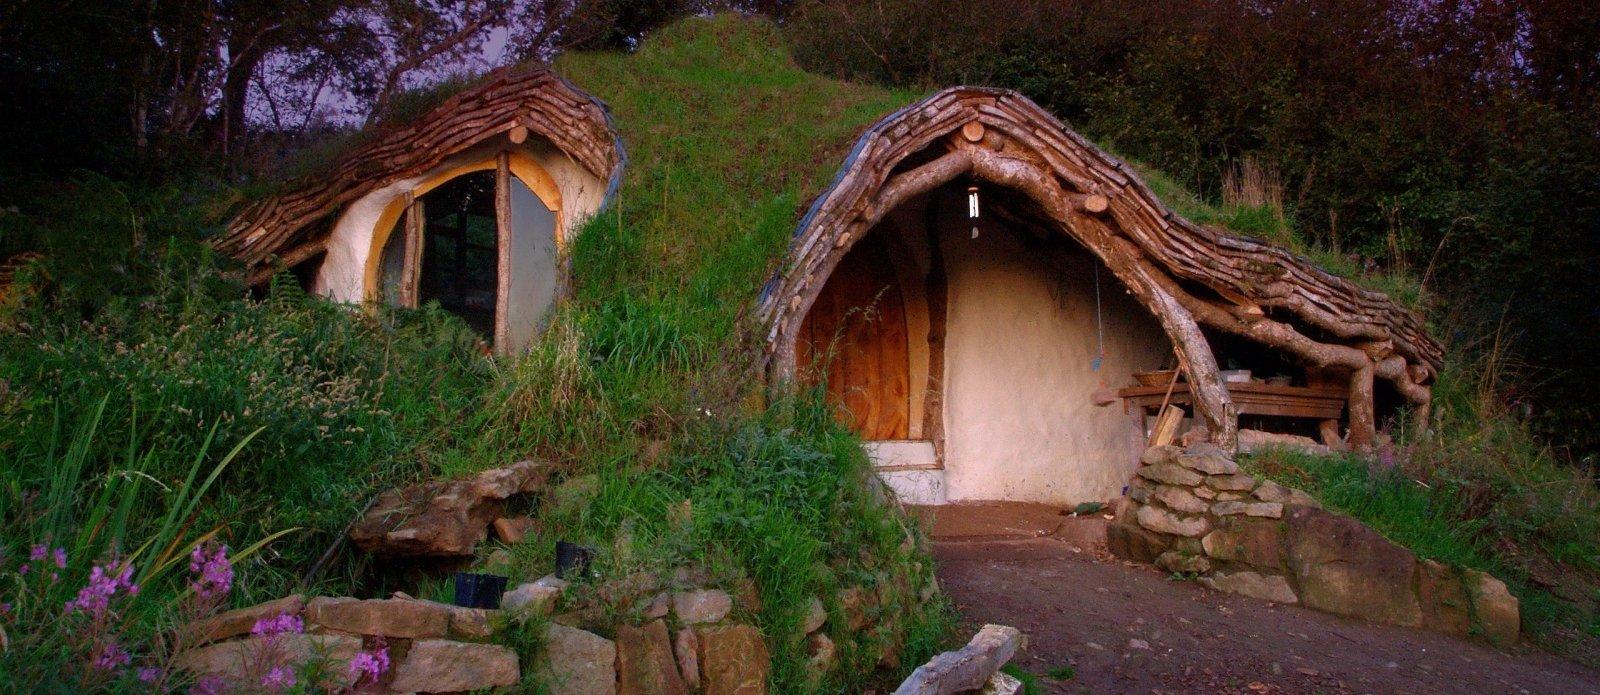 sustainable-diy-hobbit-house